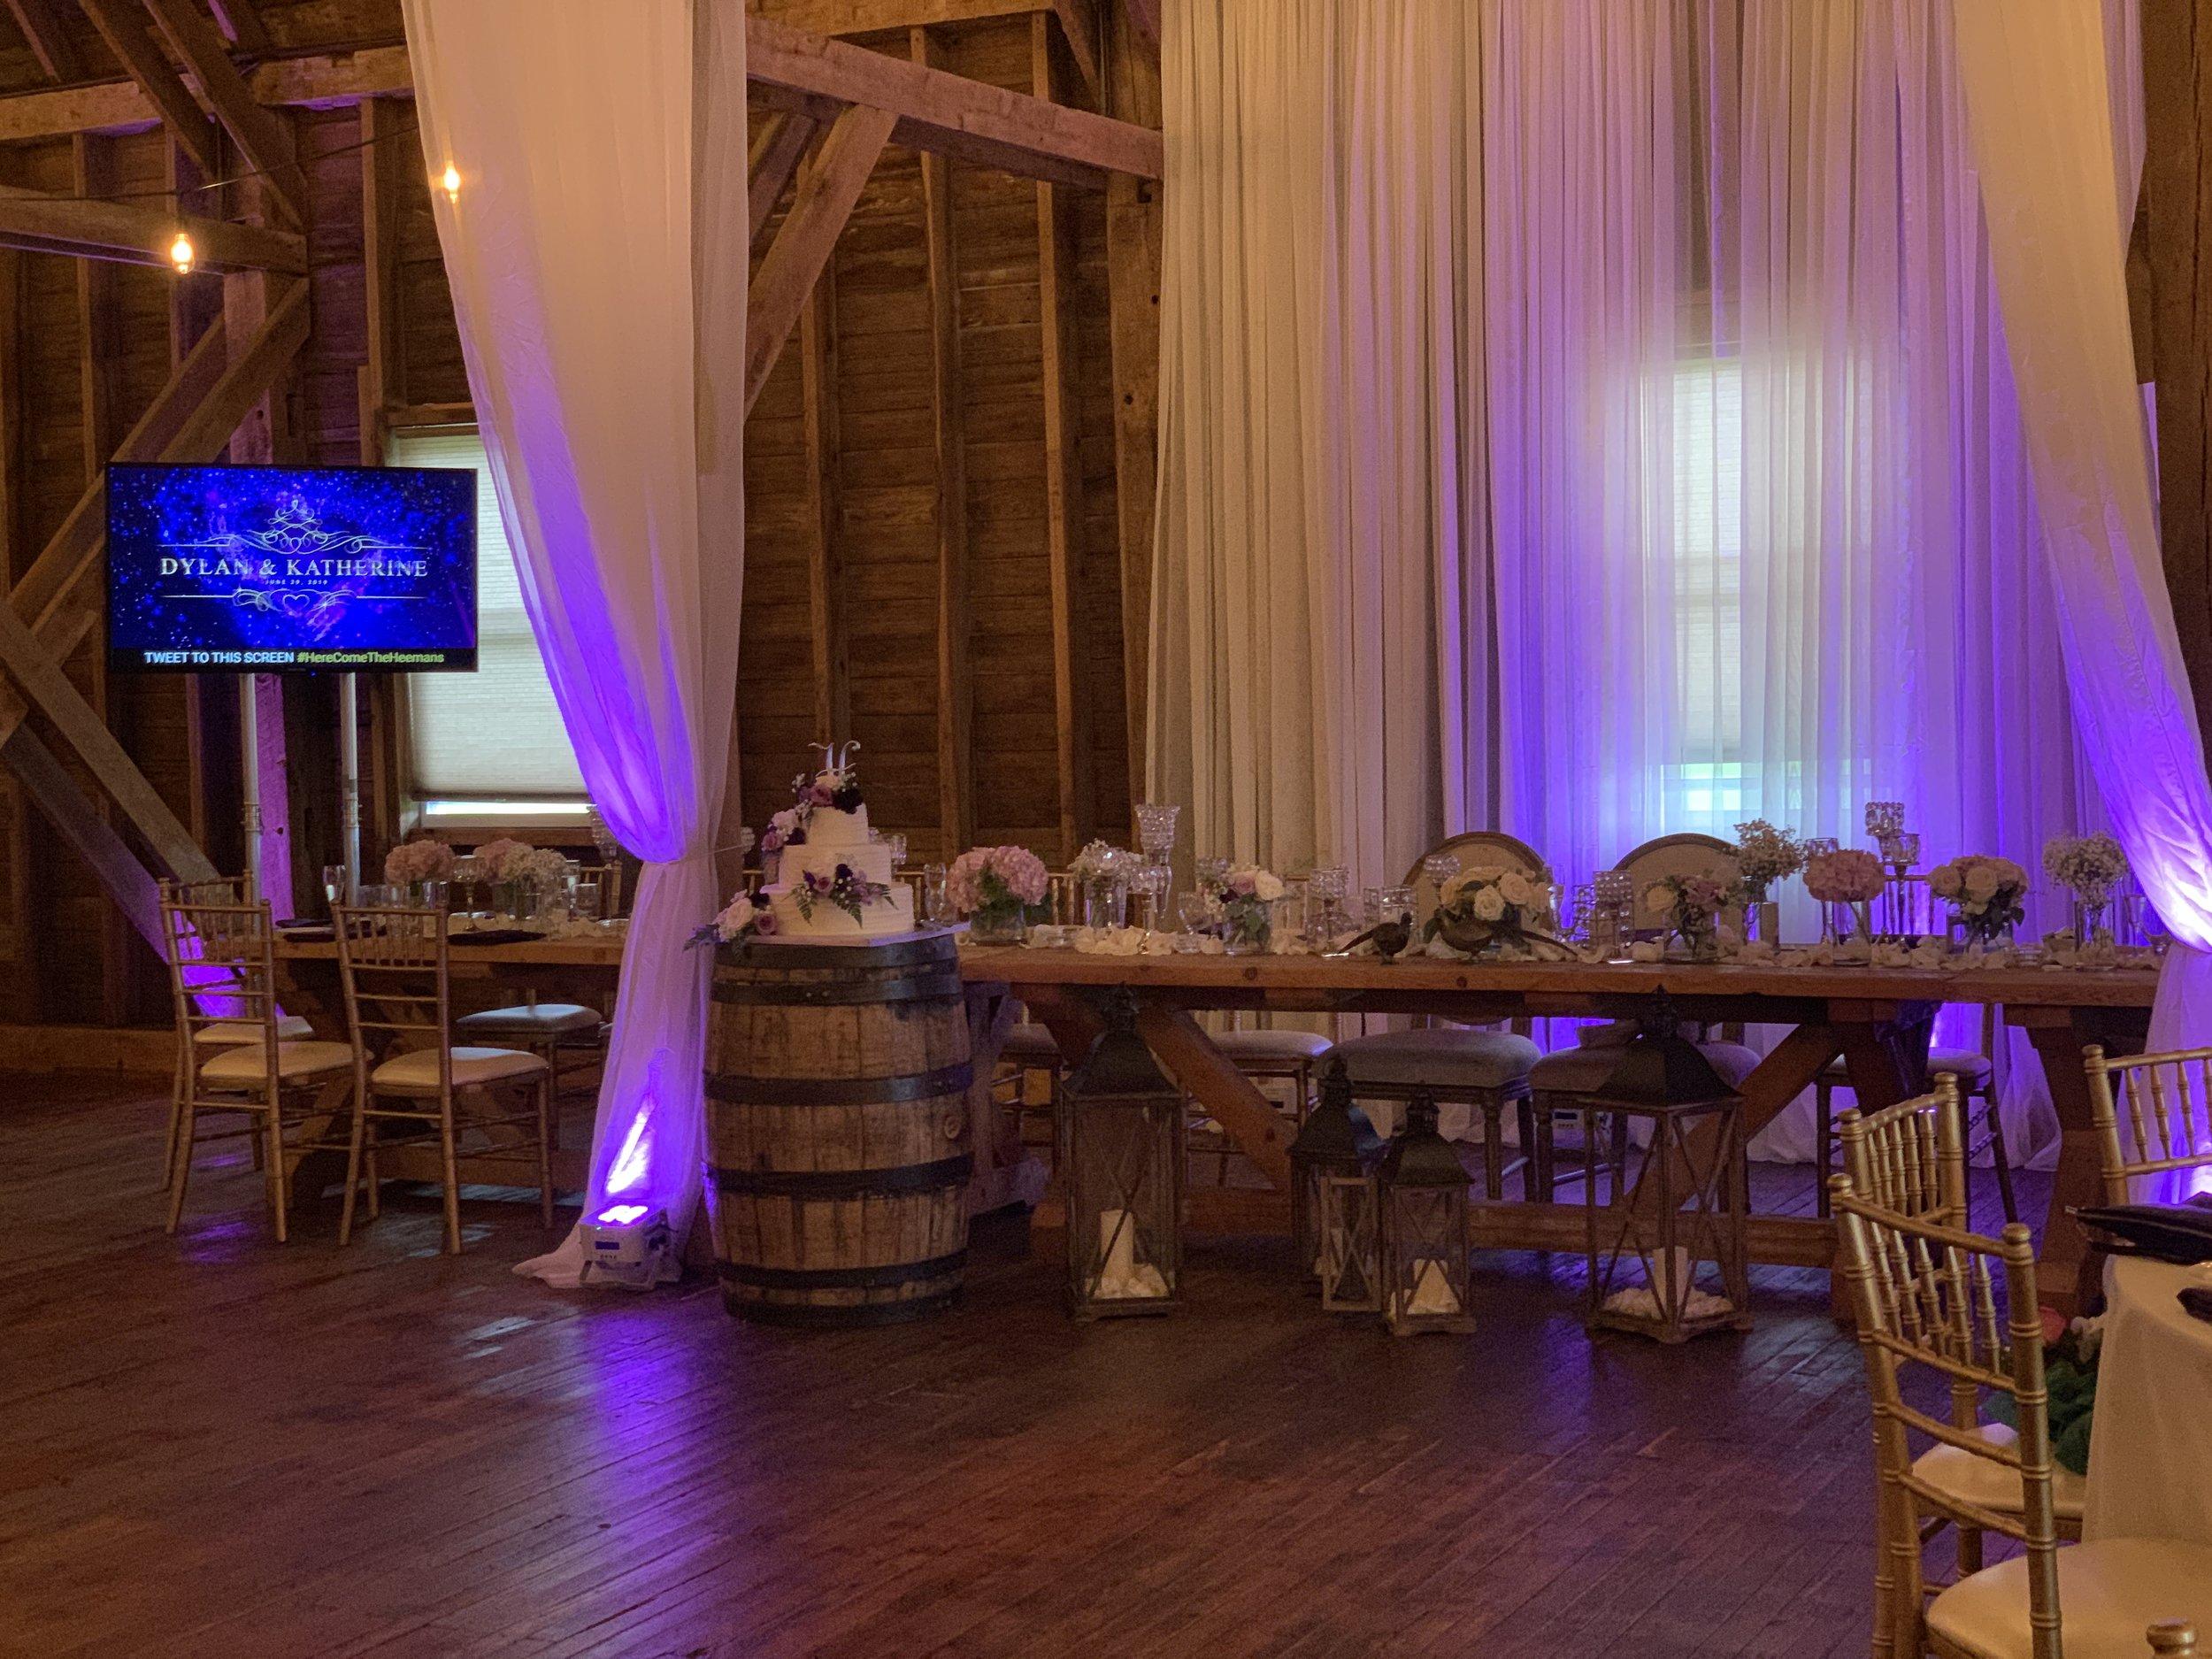 binghamton_ithaca_syracuse_elmira_cny_wedding_dj_engaged_entertainment_dylan_katherine_head_table_farm_at_cottrell_lake